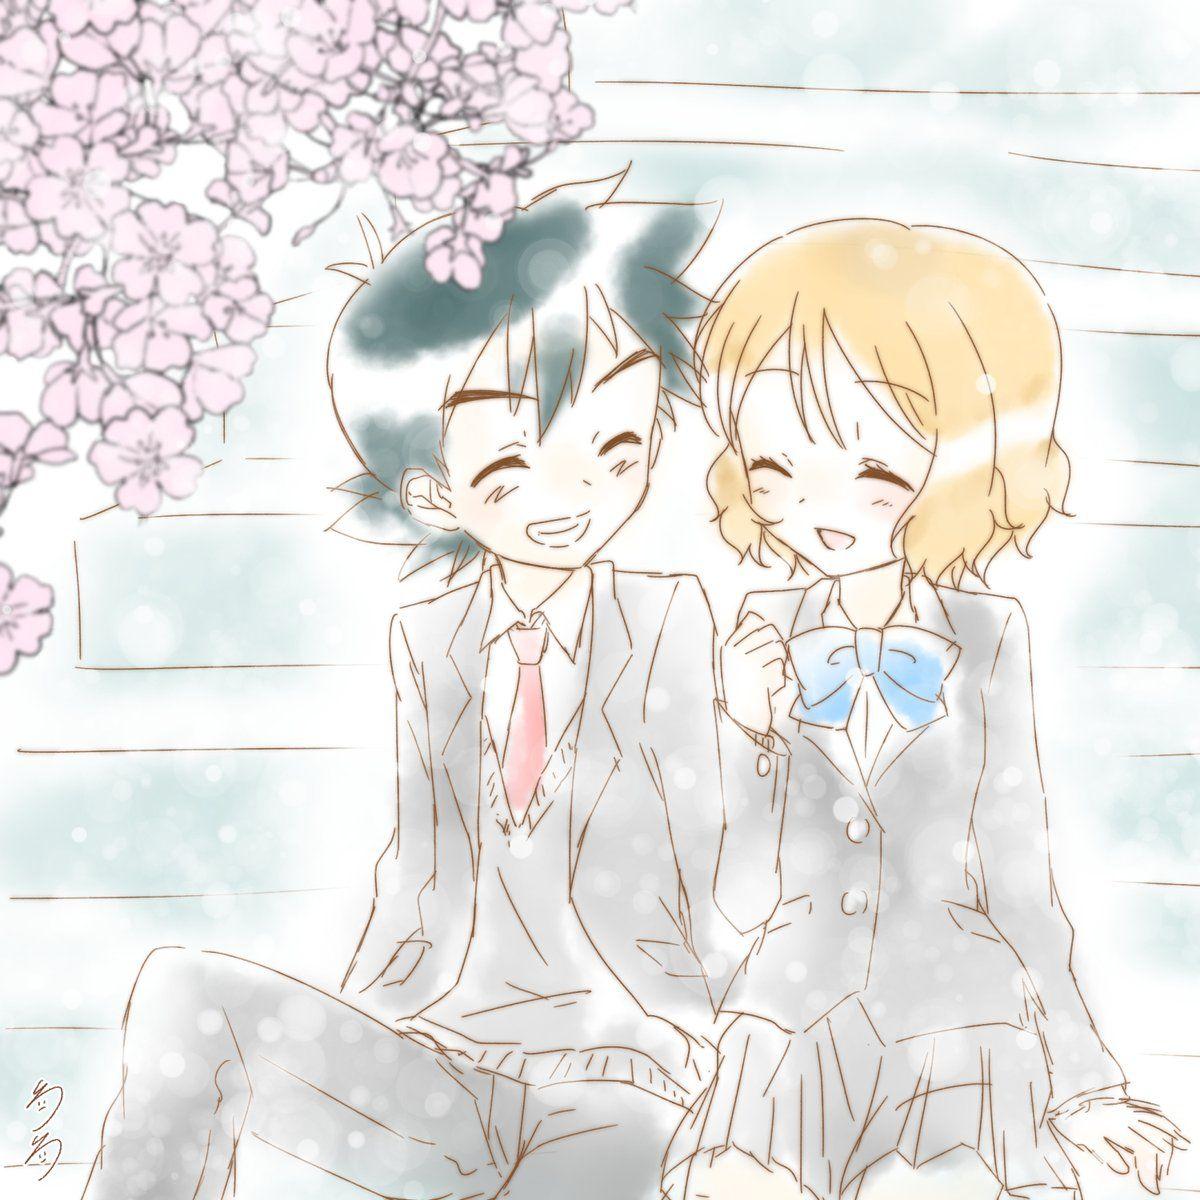 N and touko wedding - Amourshipping Satosere